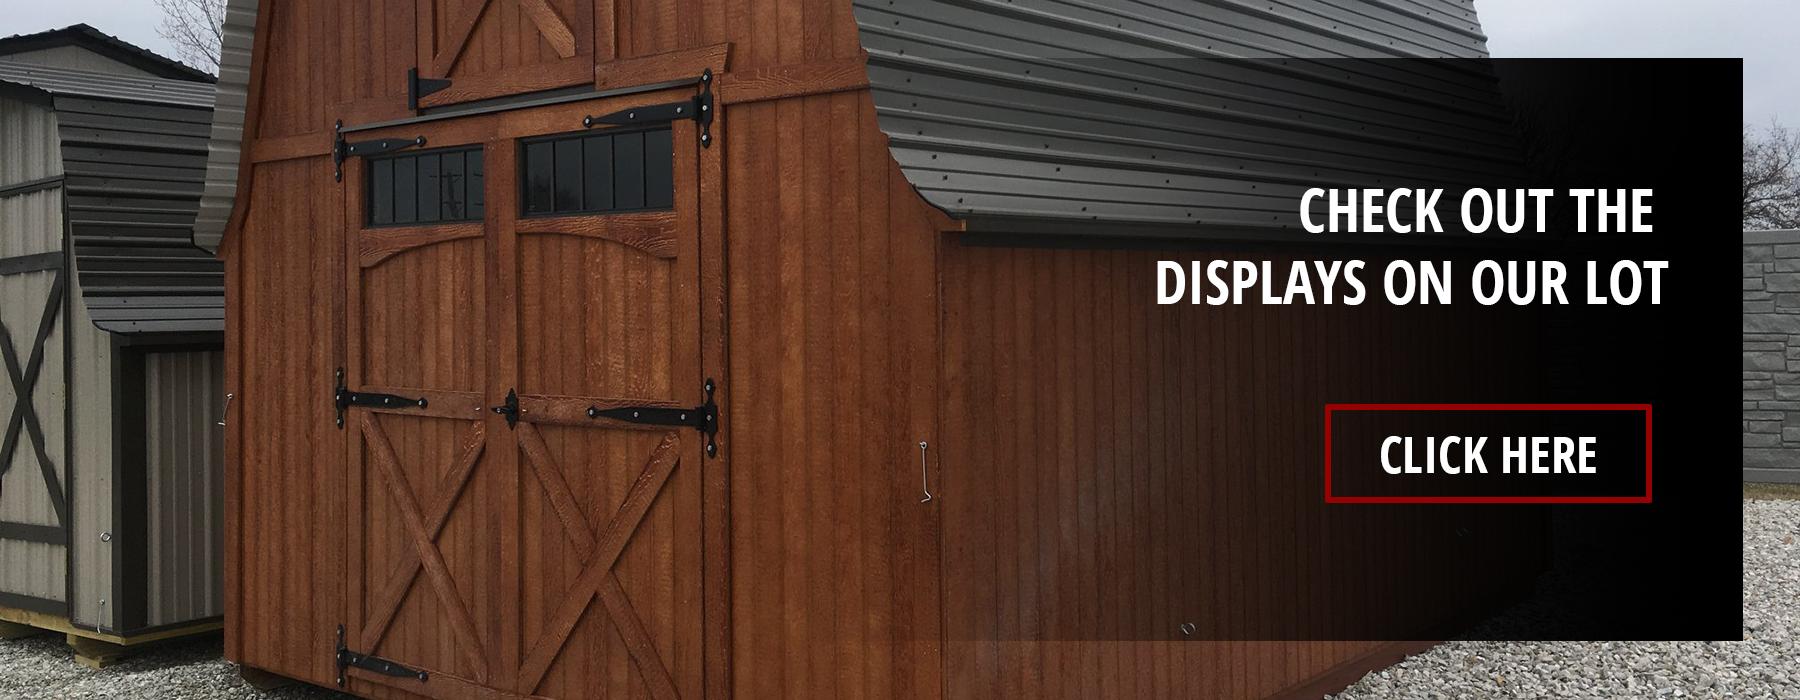 Storage Barns | Carter's Trailer Sales | Storage Barns and